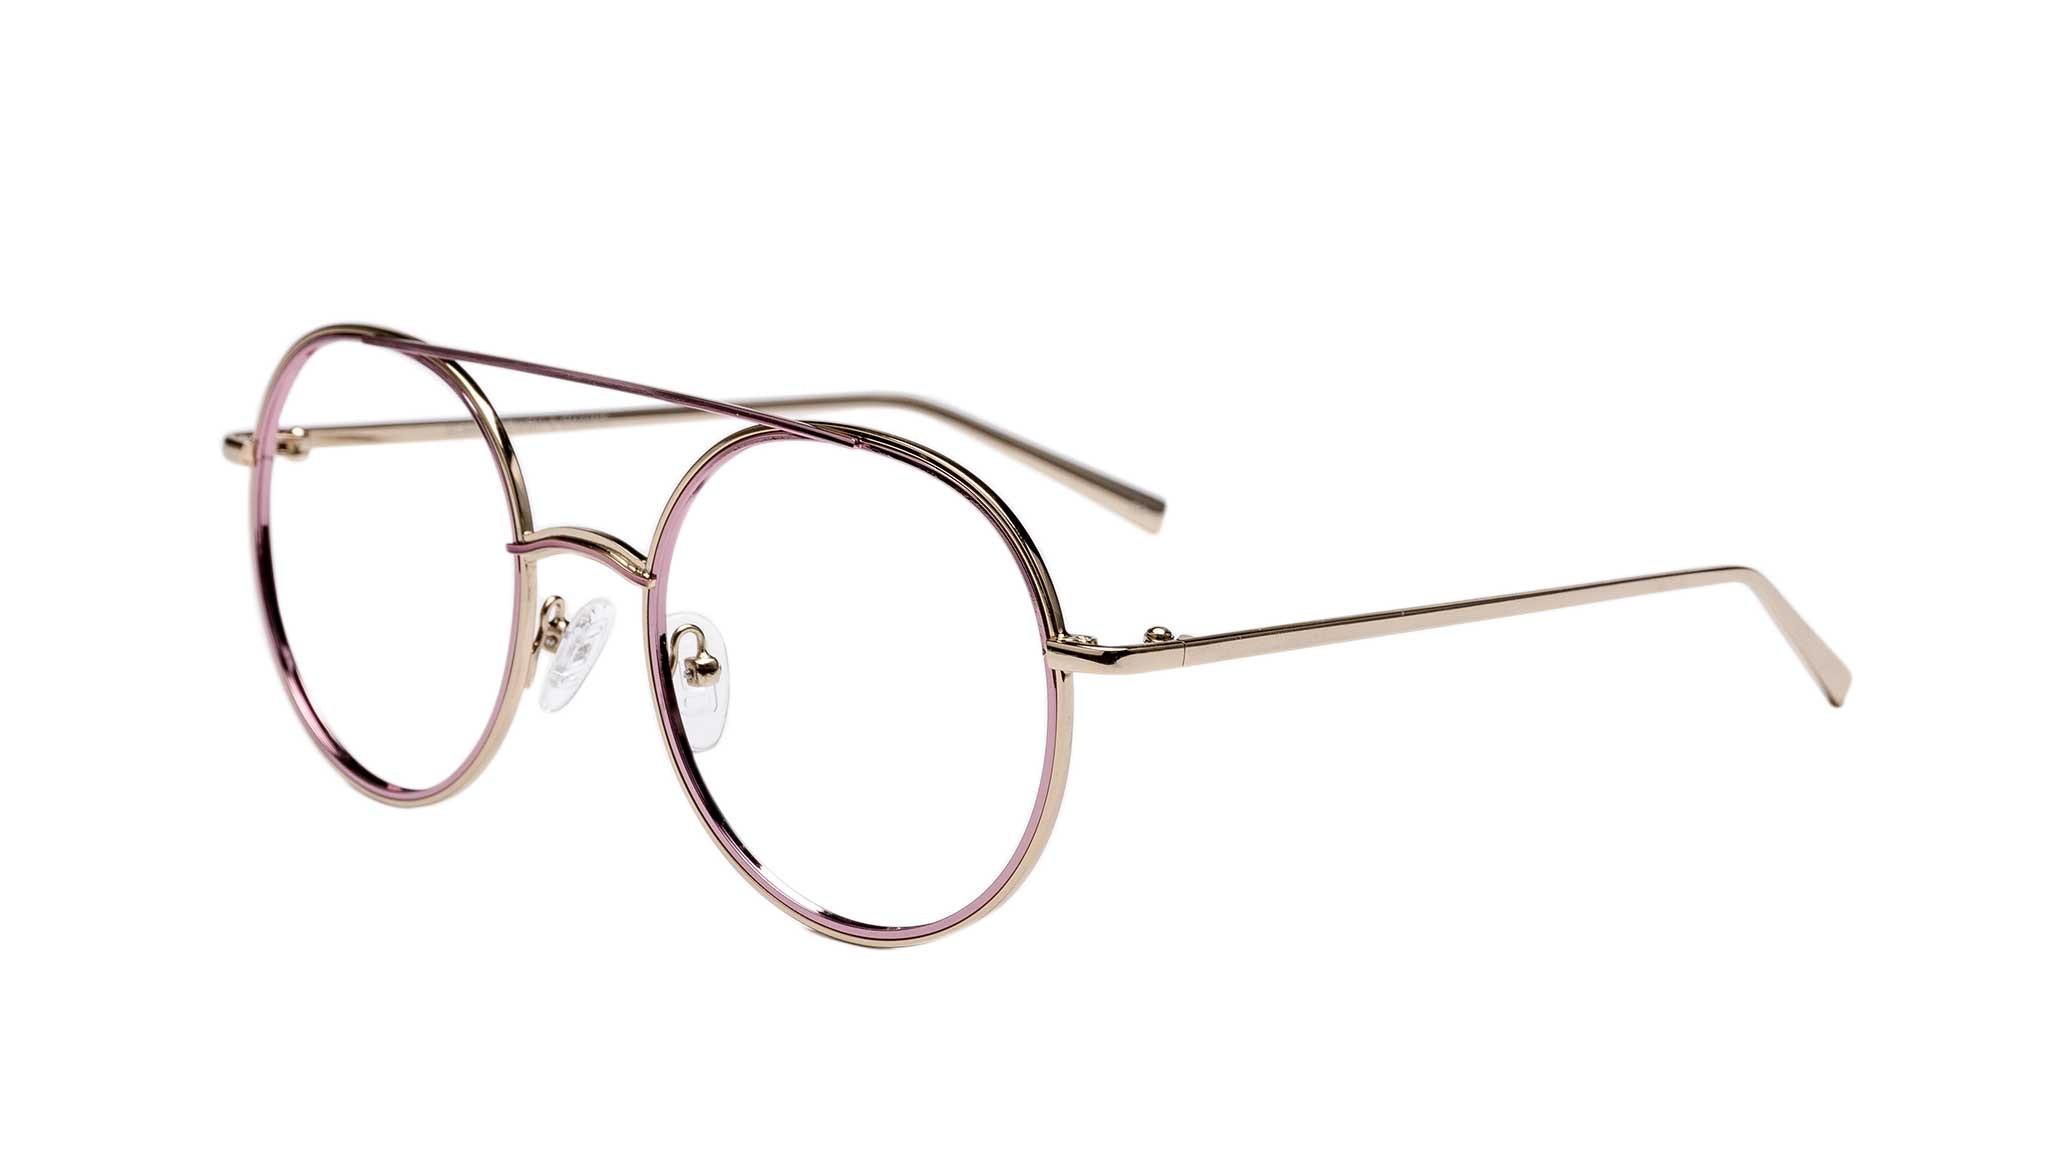 Affordable Fashion Glasses Aviator Eyeglasses Women Scarborough 2 Chains Tilt